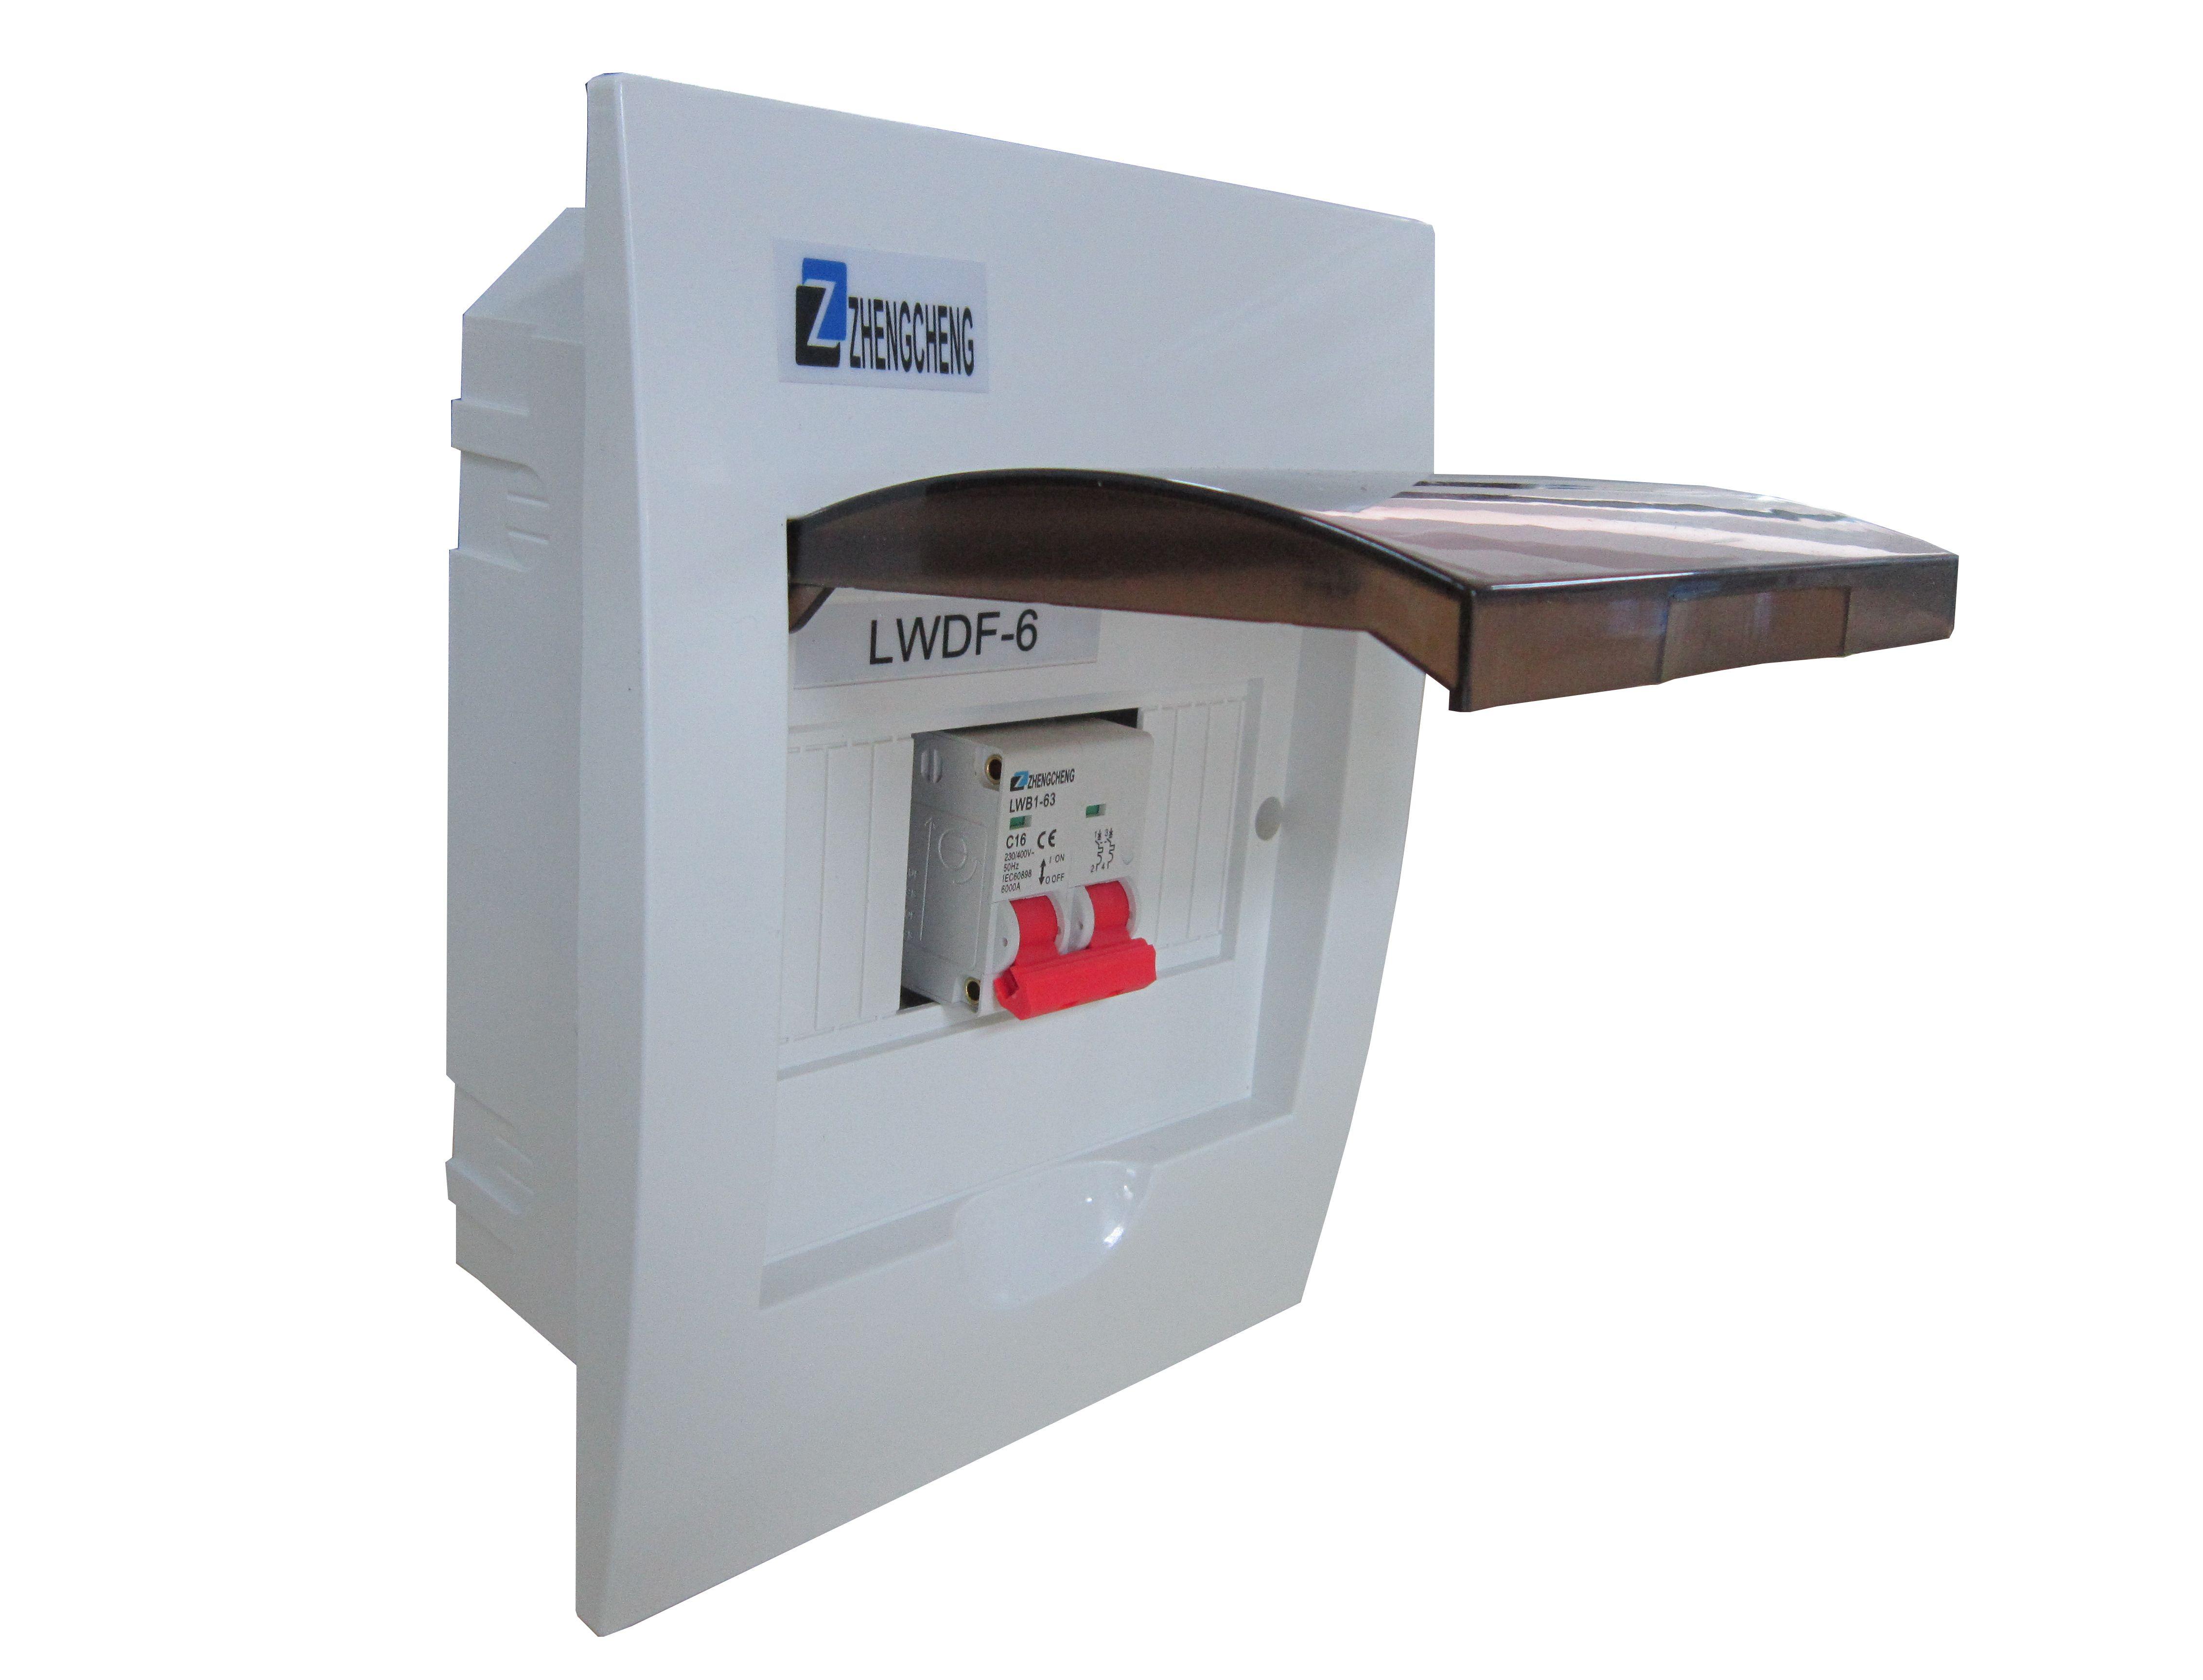 6 Way Flush Mount Distribution Box Mcb Miniature Circuit Breaker Double Poles 2p Elcb Earth Leakage Diy Electricals